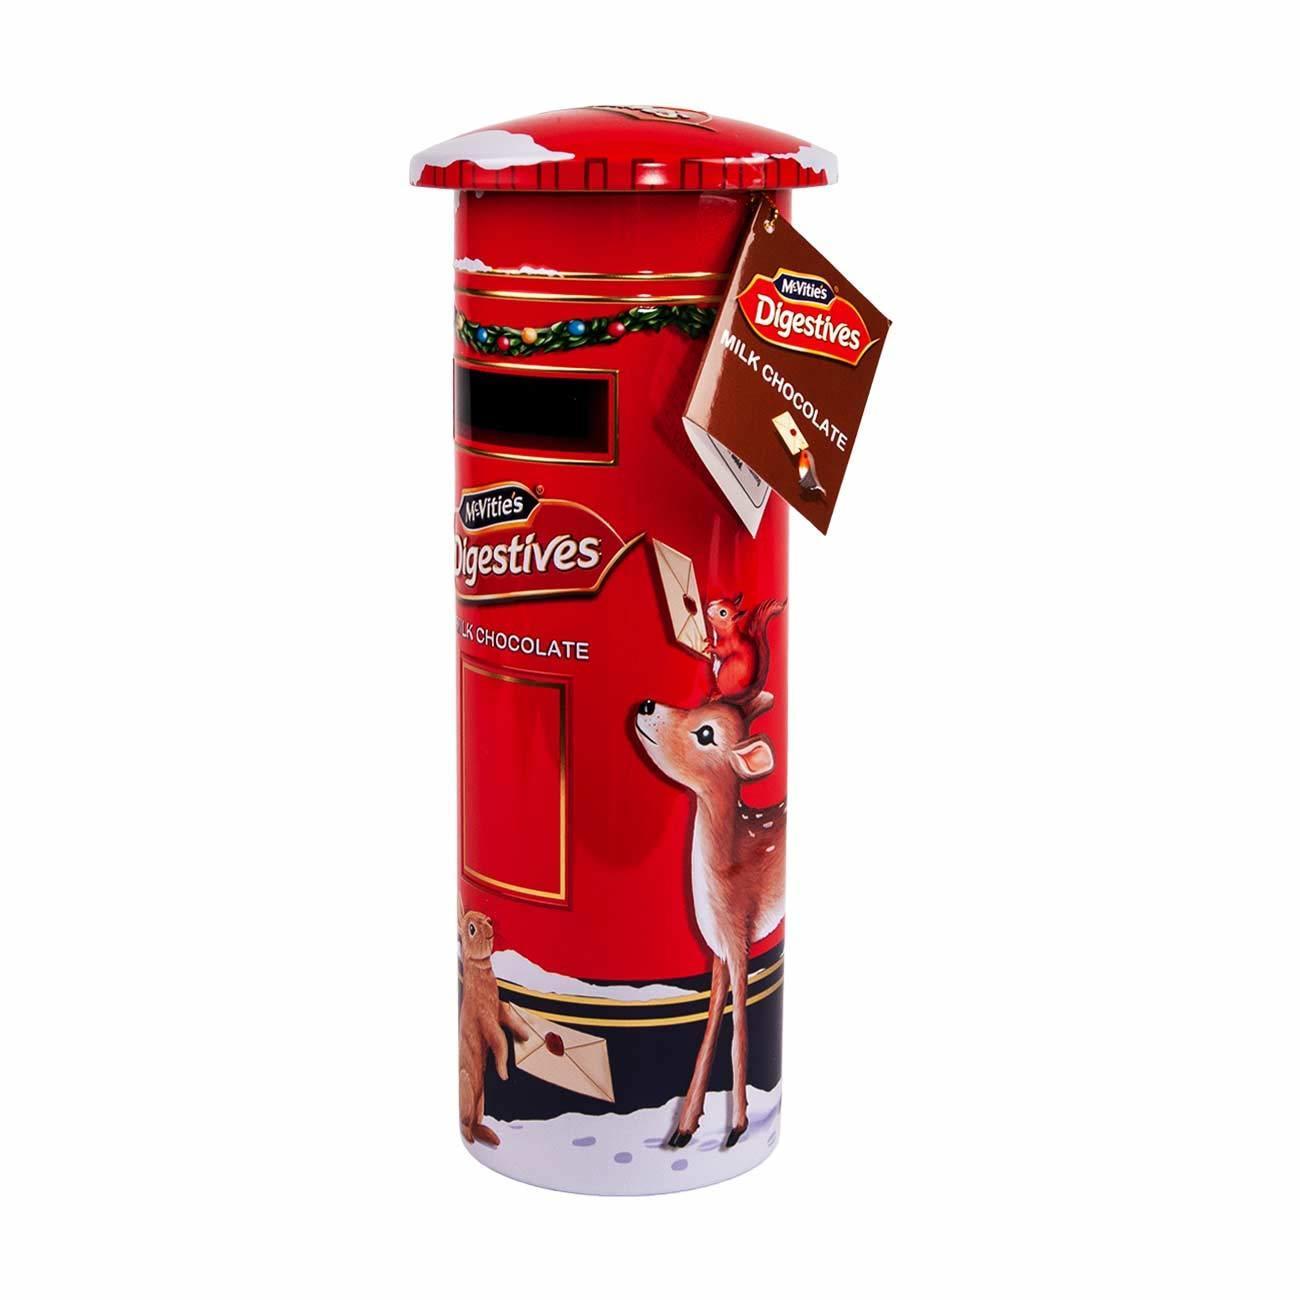 Mcvities Milk Chocolate Digestive Post Box Tin (400g) image